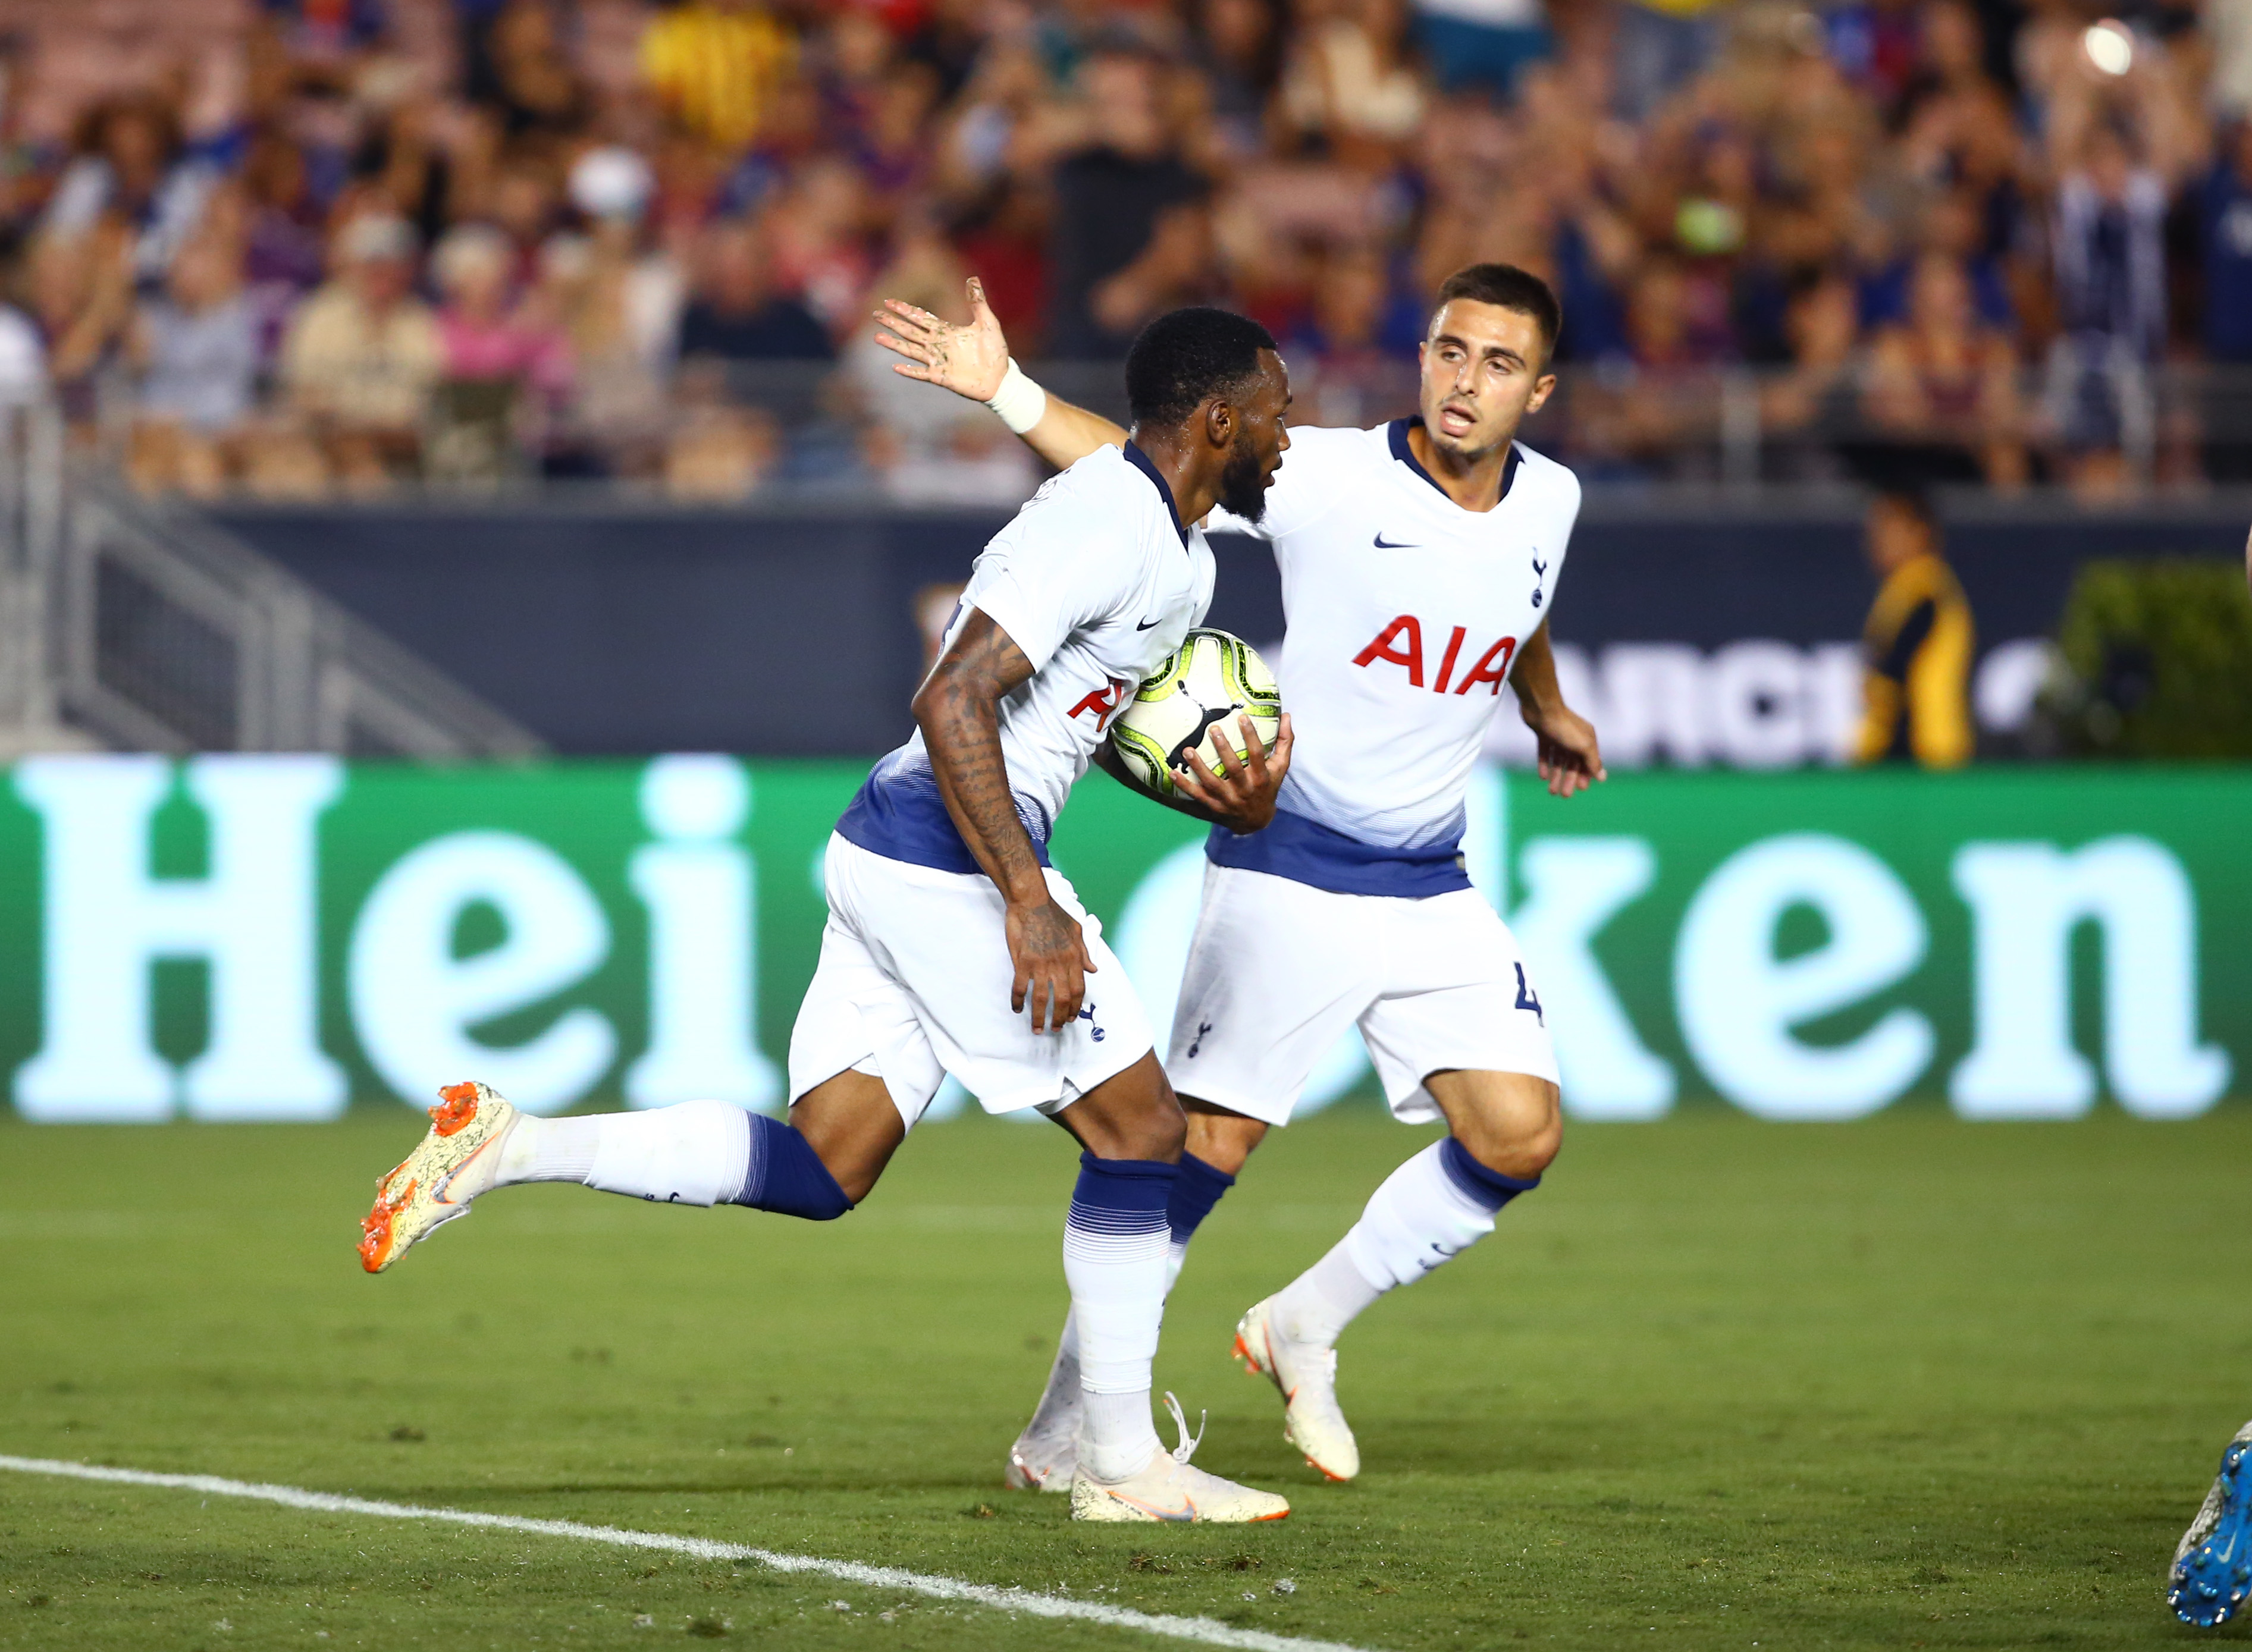 The decline of Tottenham Hotspur